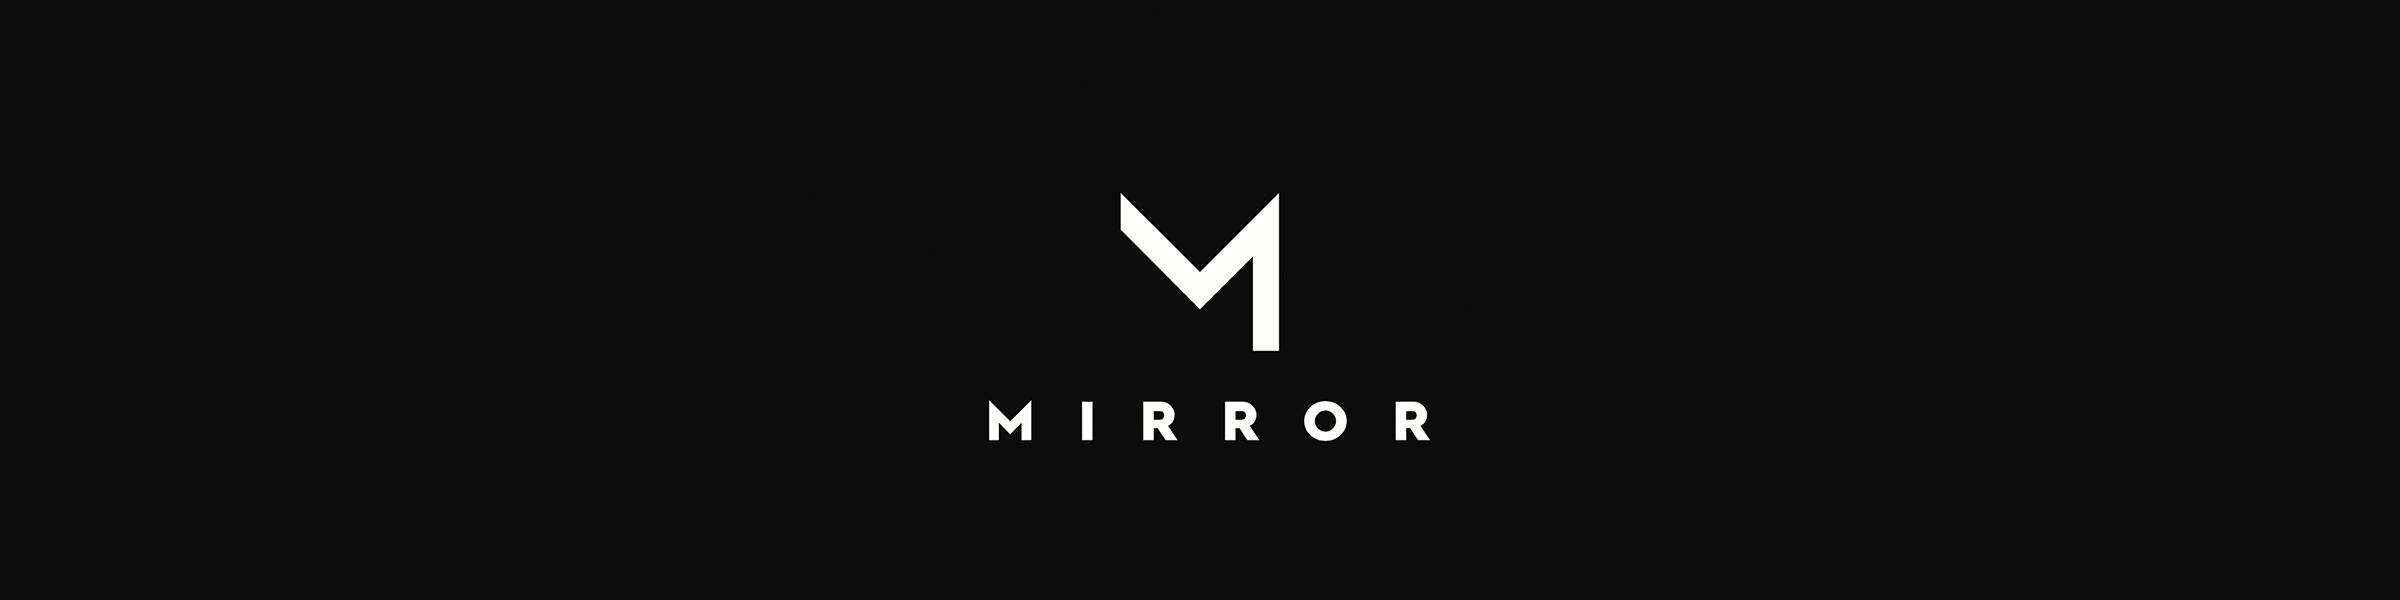 mMirror Logo